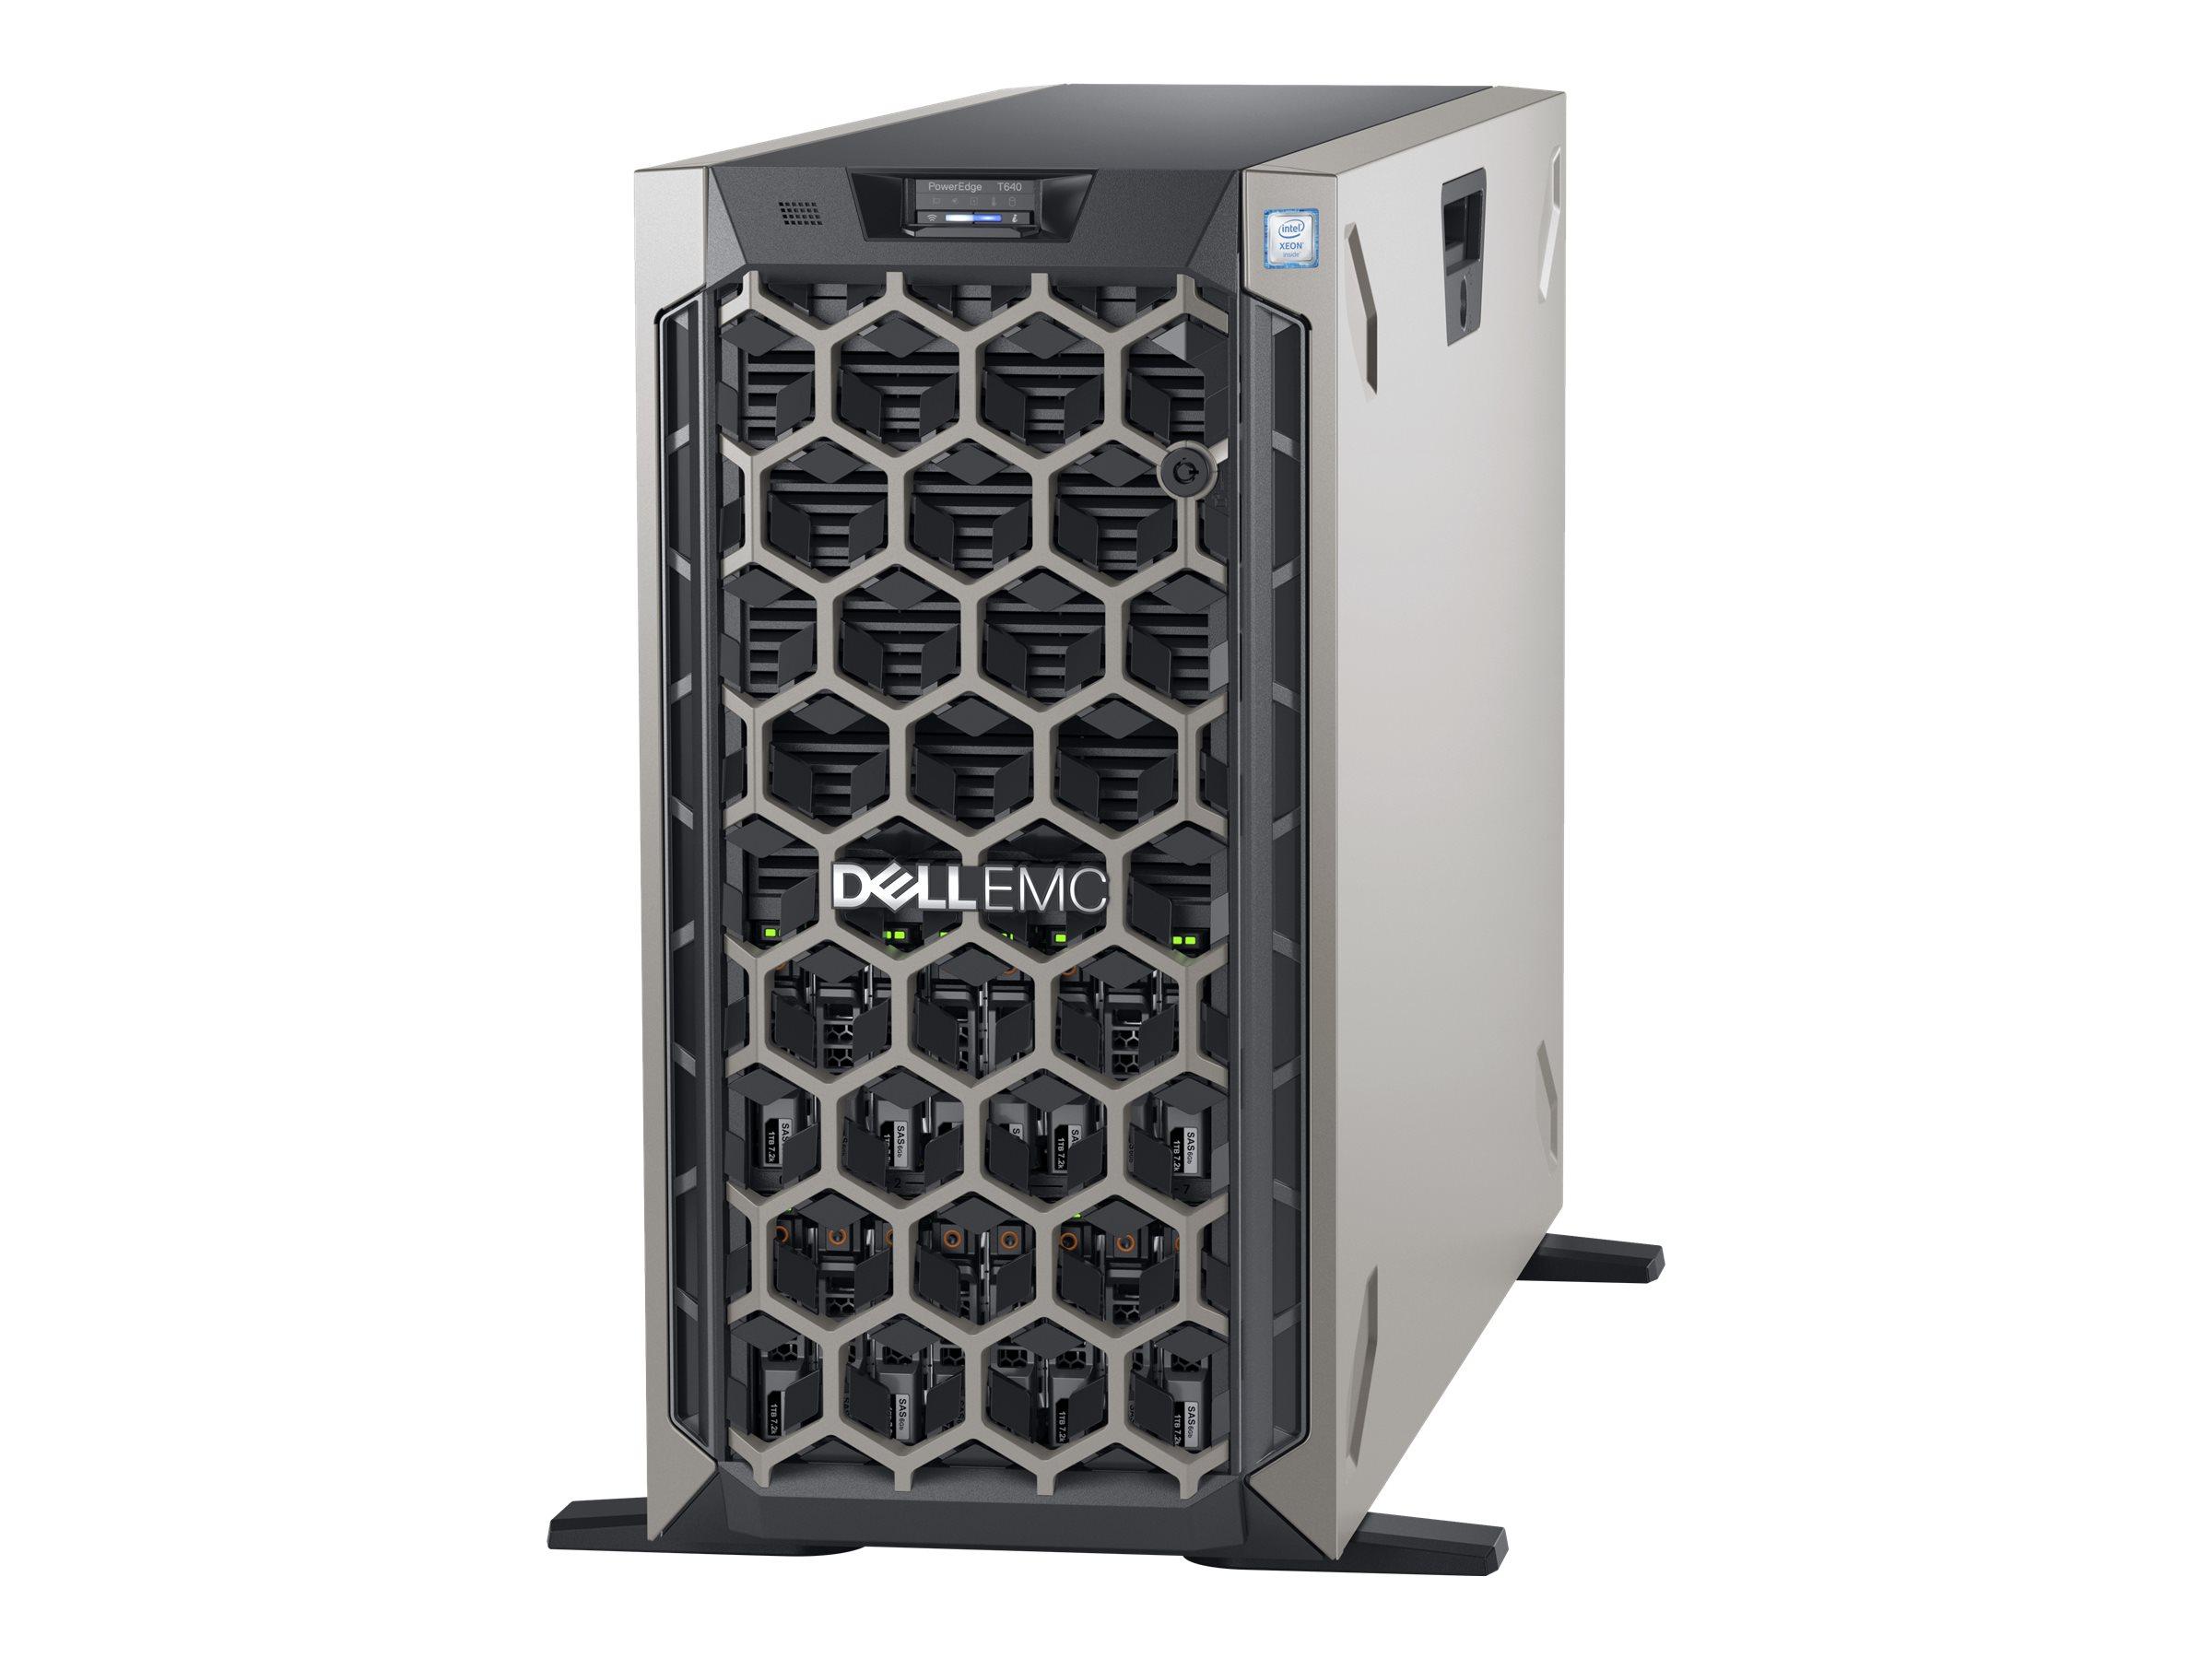 Dell EMC PowerEdge T640 - Server - Tower - 5U - zweiweg - 1 x Xeon Silver 4110 / 2.1 GHz - RAM 16 GB - SAS - Hot-Swap 6.